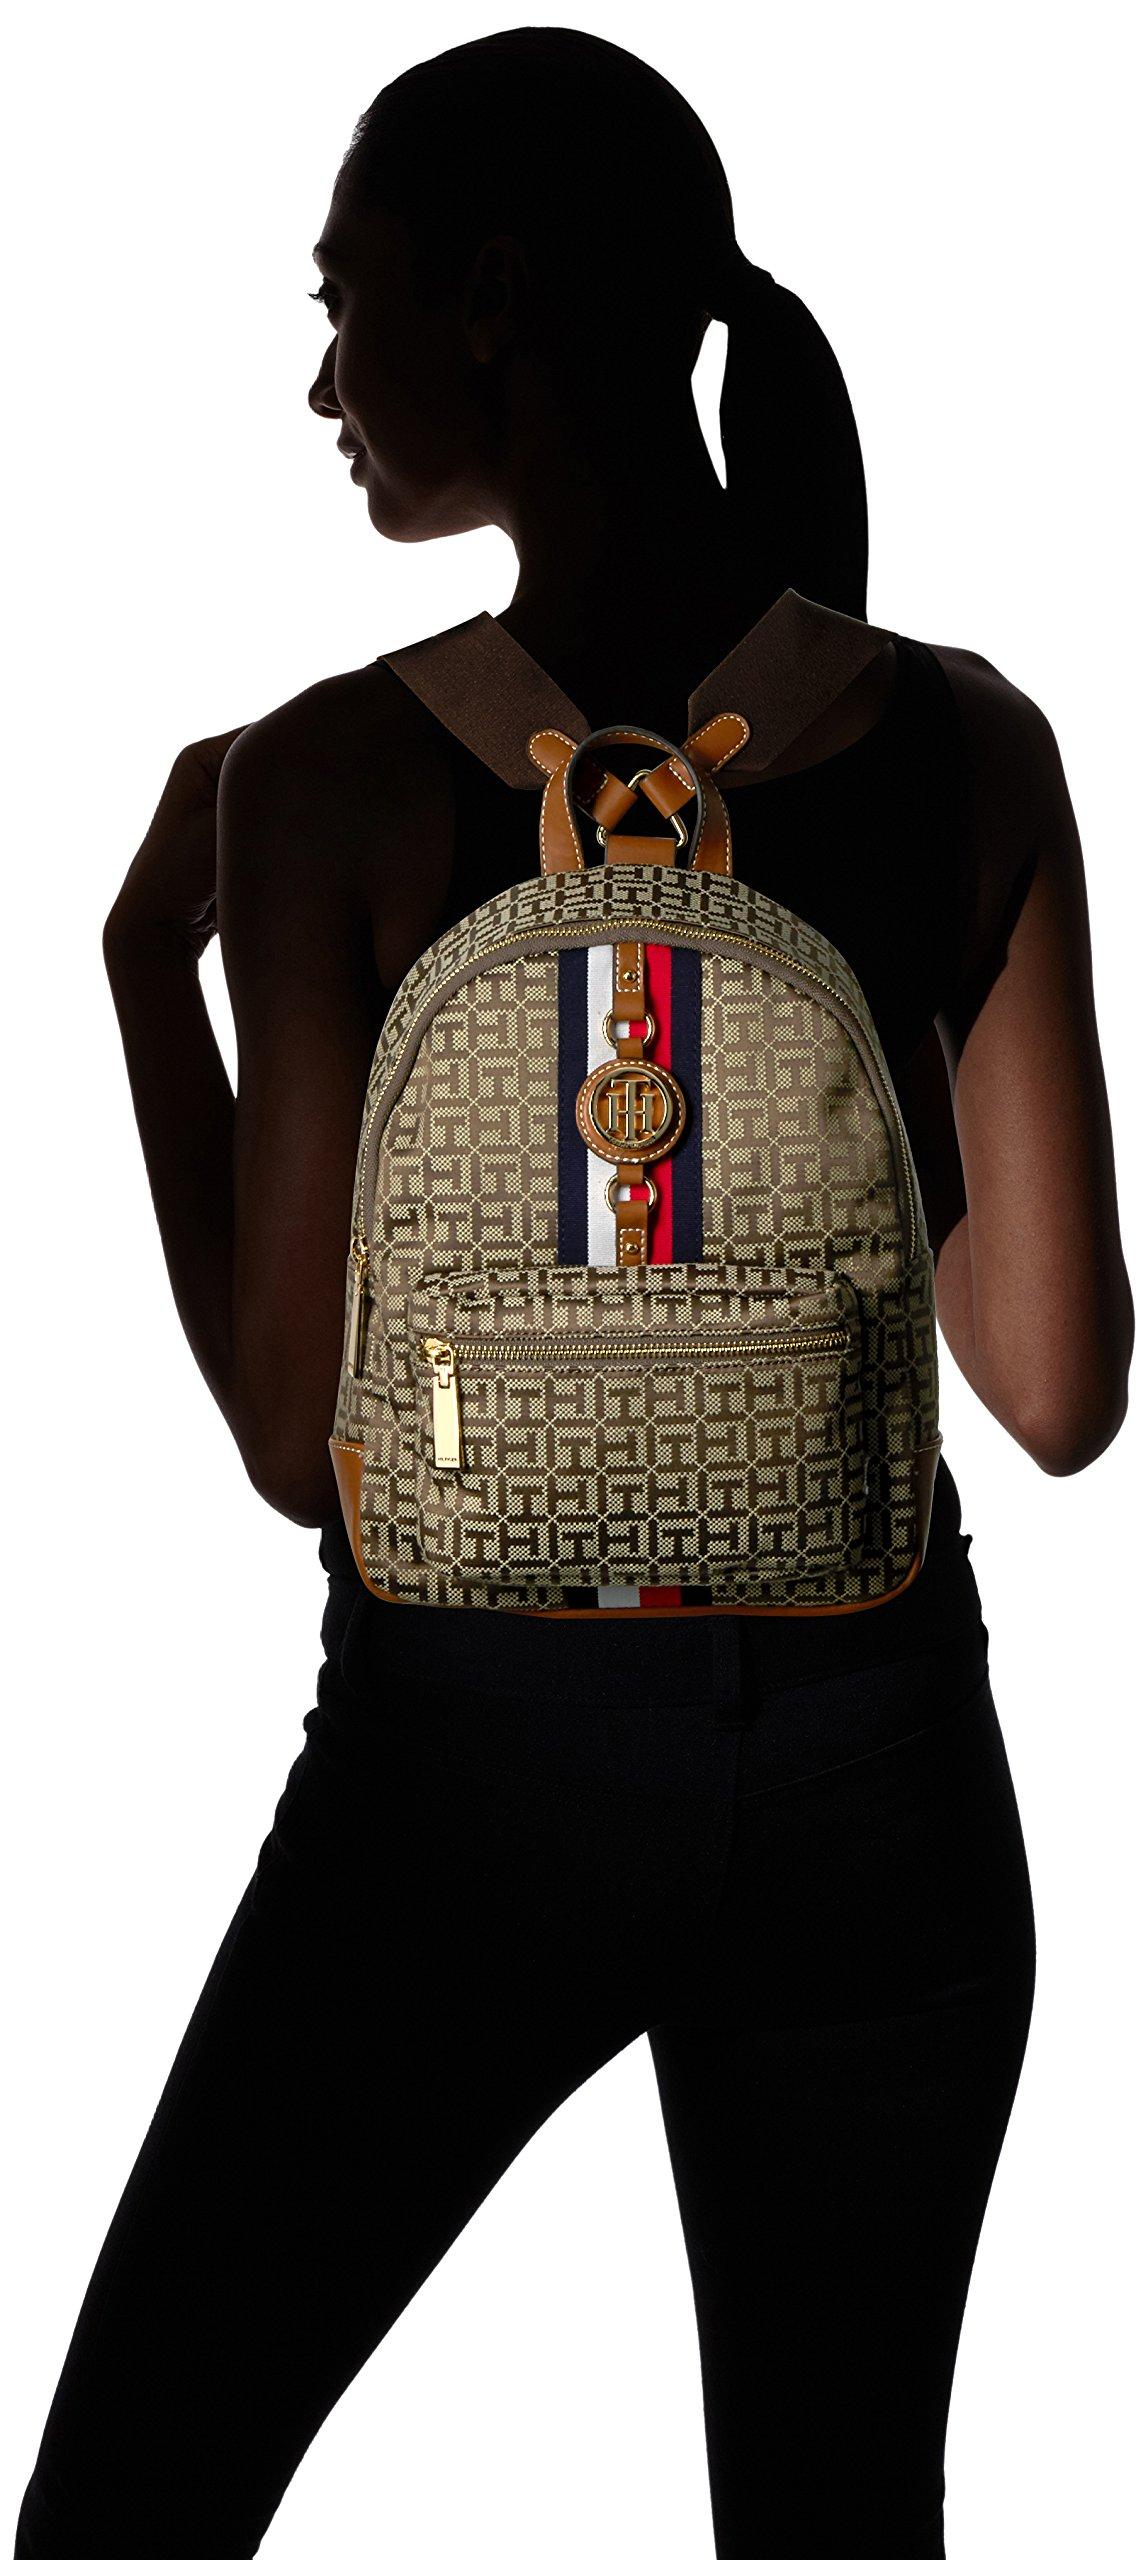 Tommy Hilfiger Women's Backpack Jaden, Tan Dark Chocolate by Tommy Hilfiger (Image #4)